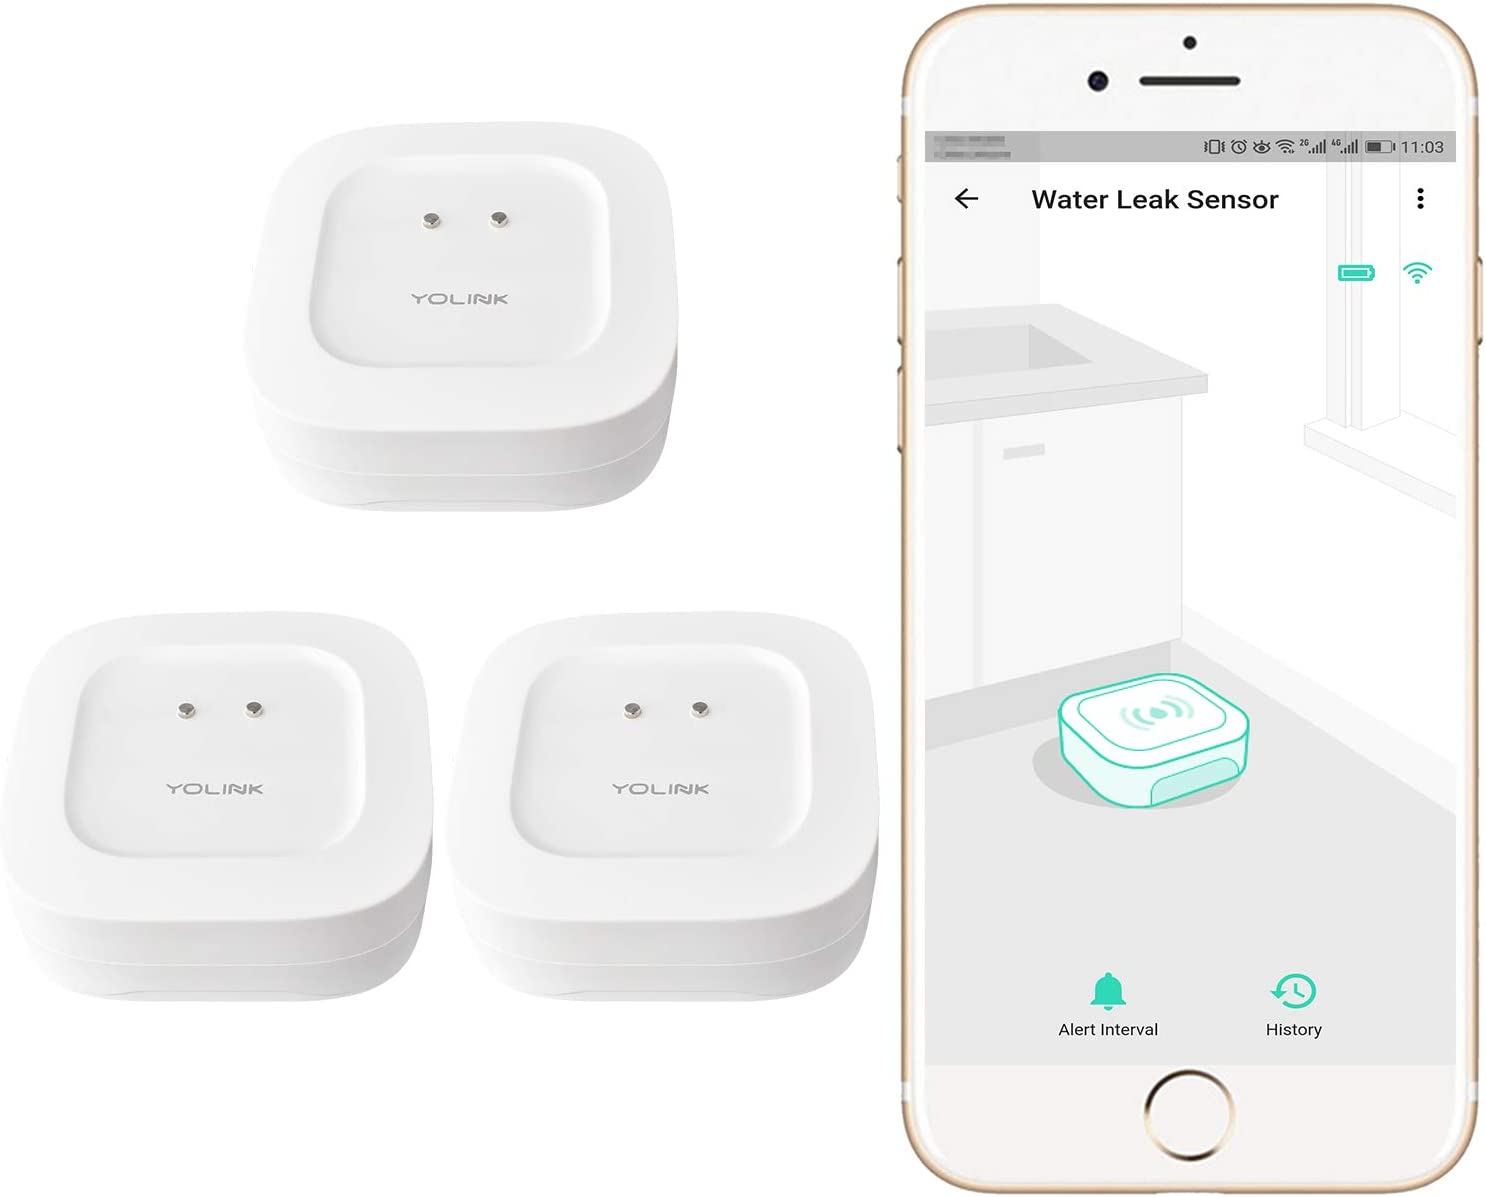 Smart Water Leak Sensor 3 Pack, YoLink 1/4 Mile World's Longest Range Wireless Water Sensor Work with Alexa IFTTT, Water Leak Detector with App Notifications and Remote Monitoring, YoLink Hub Required